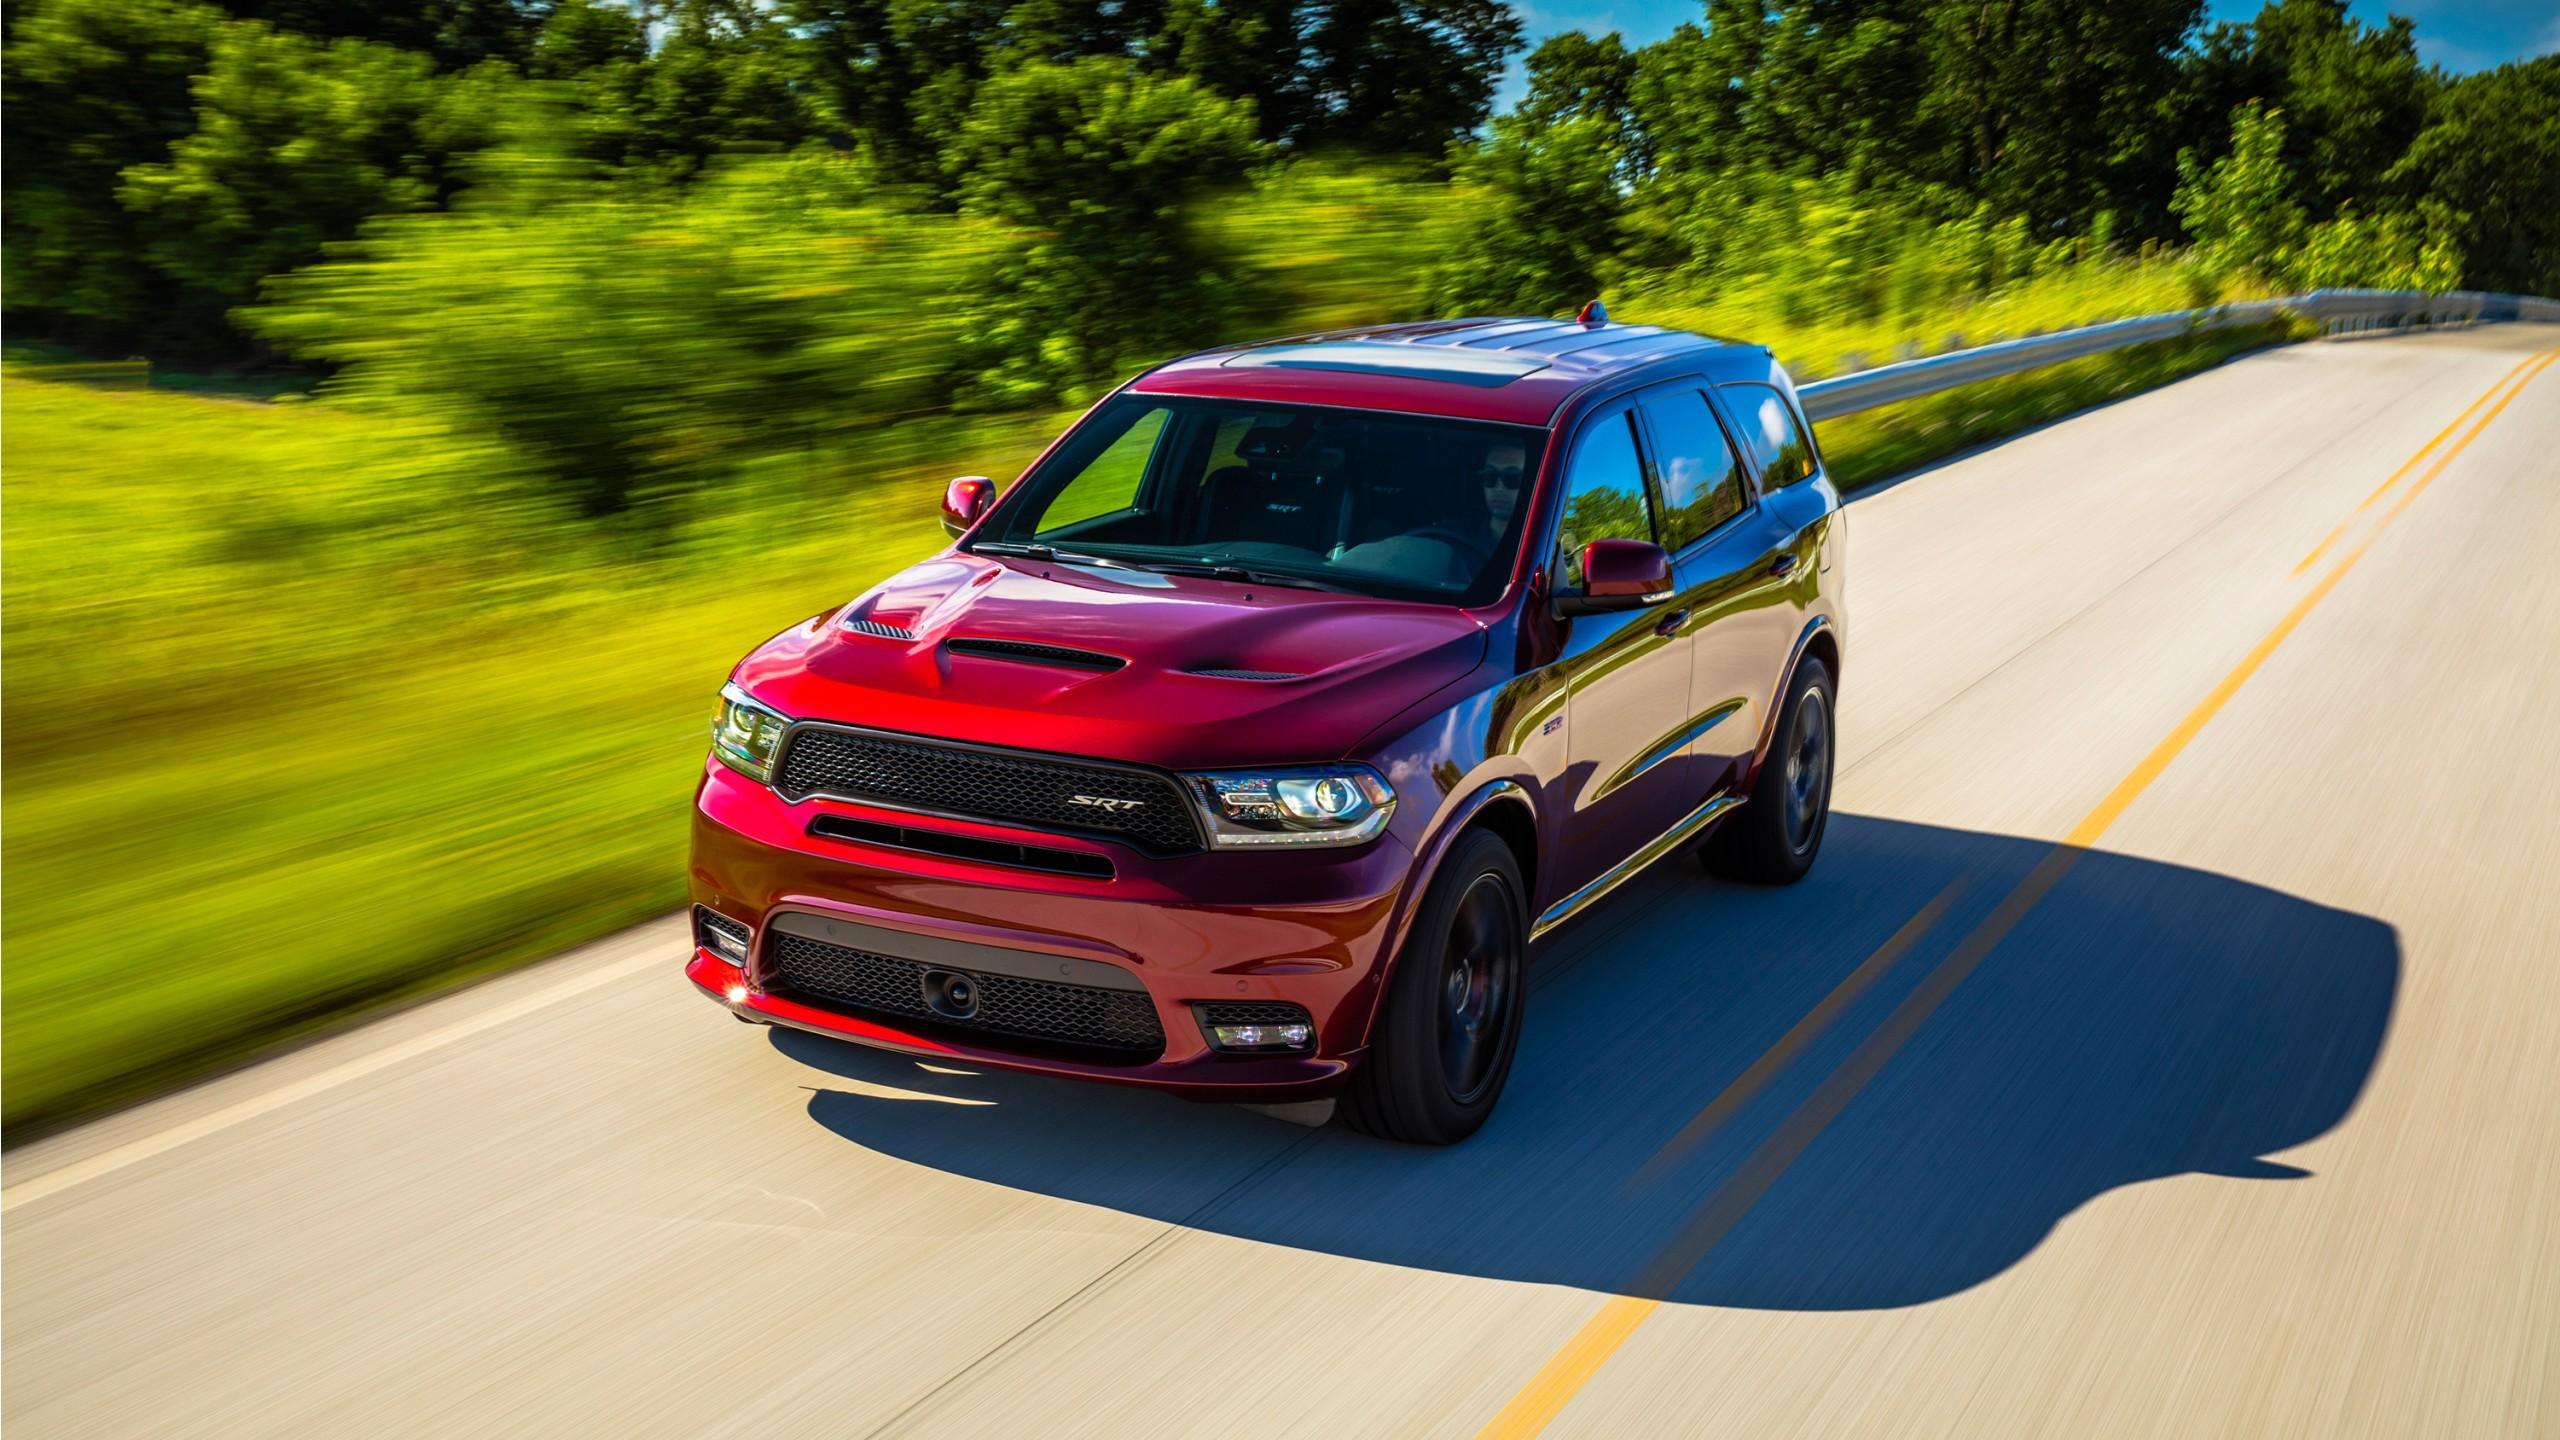 Ram 1500 Rebel >> Dodge Durango SRT 2018 Wallpaper   HD Car Wallpapers   ID #8021